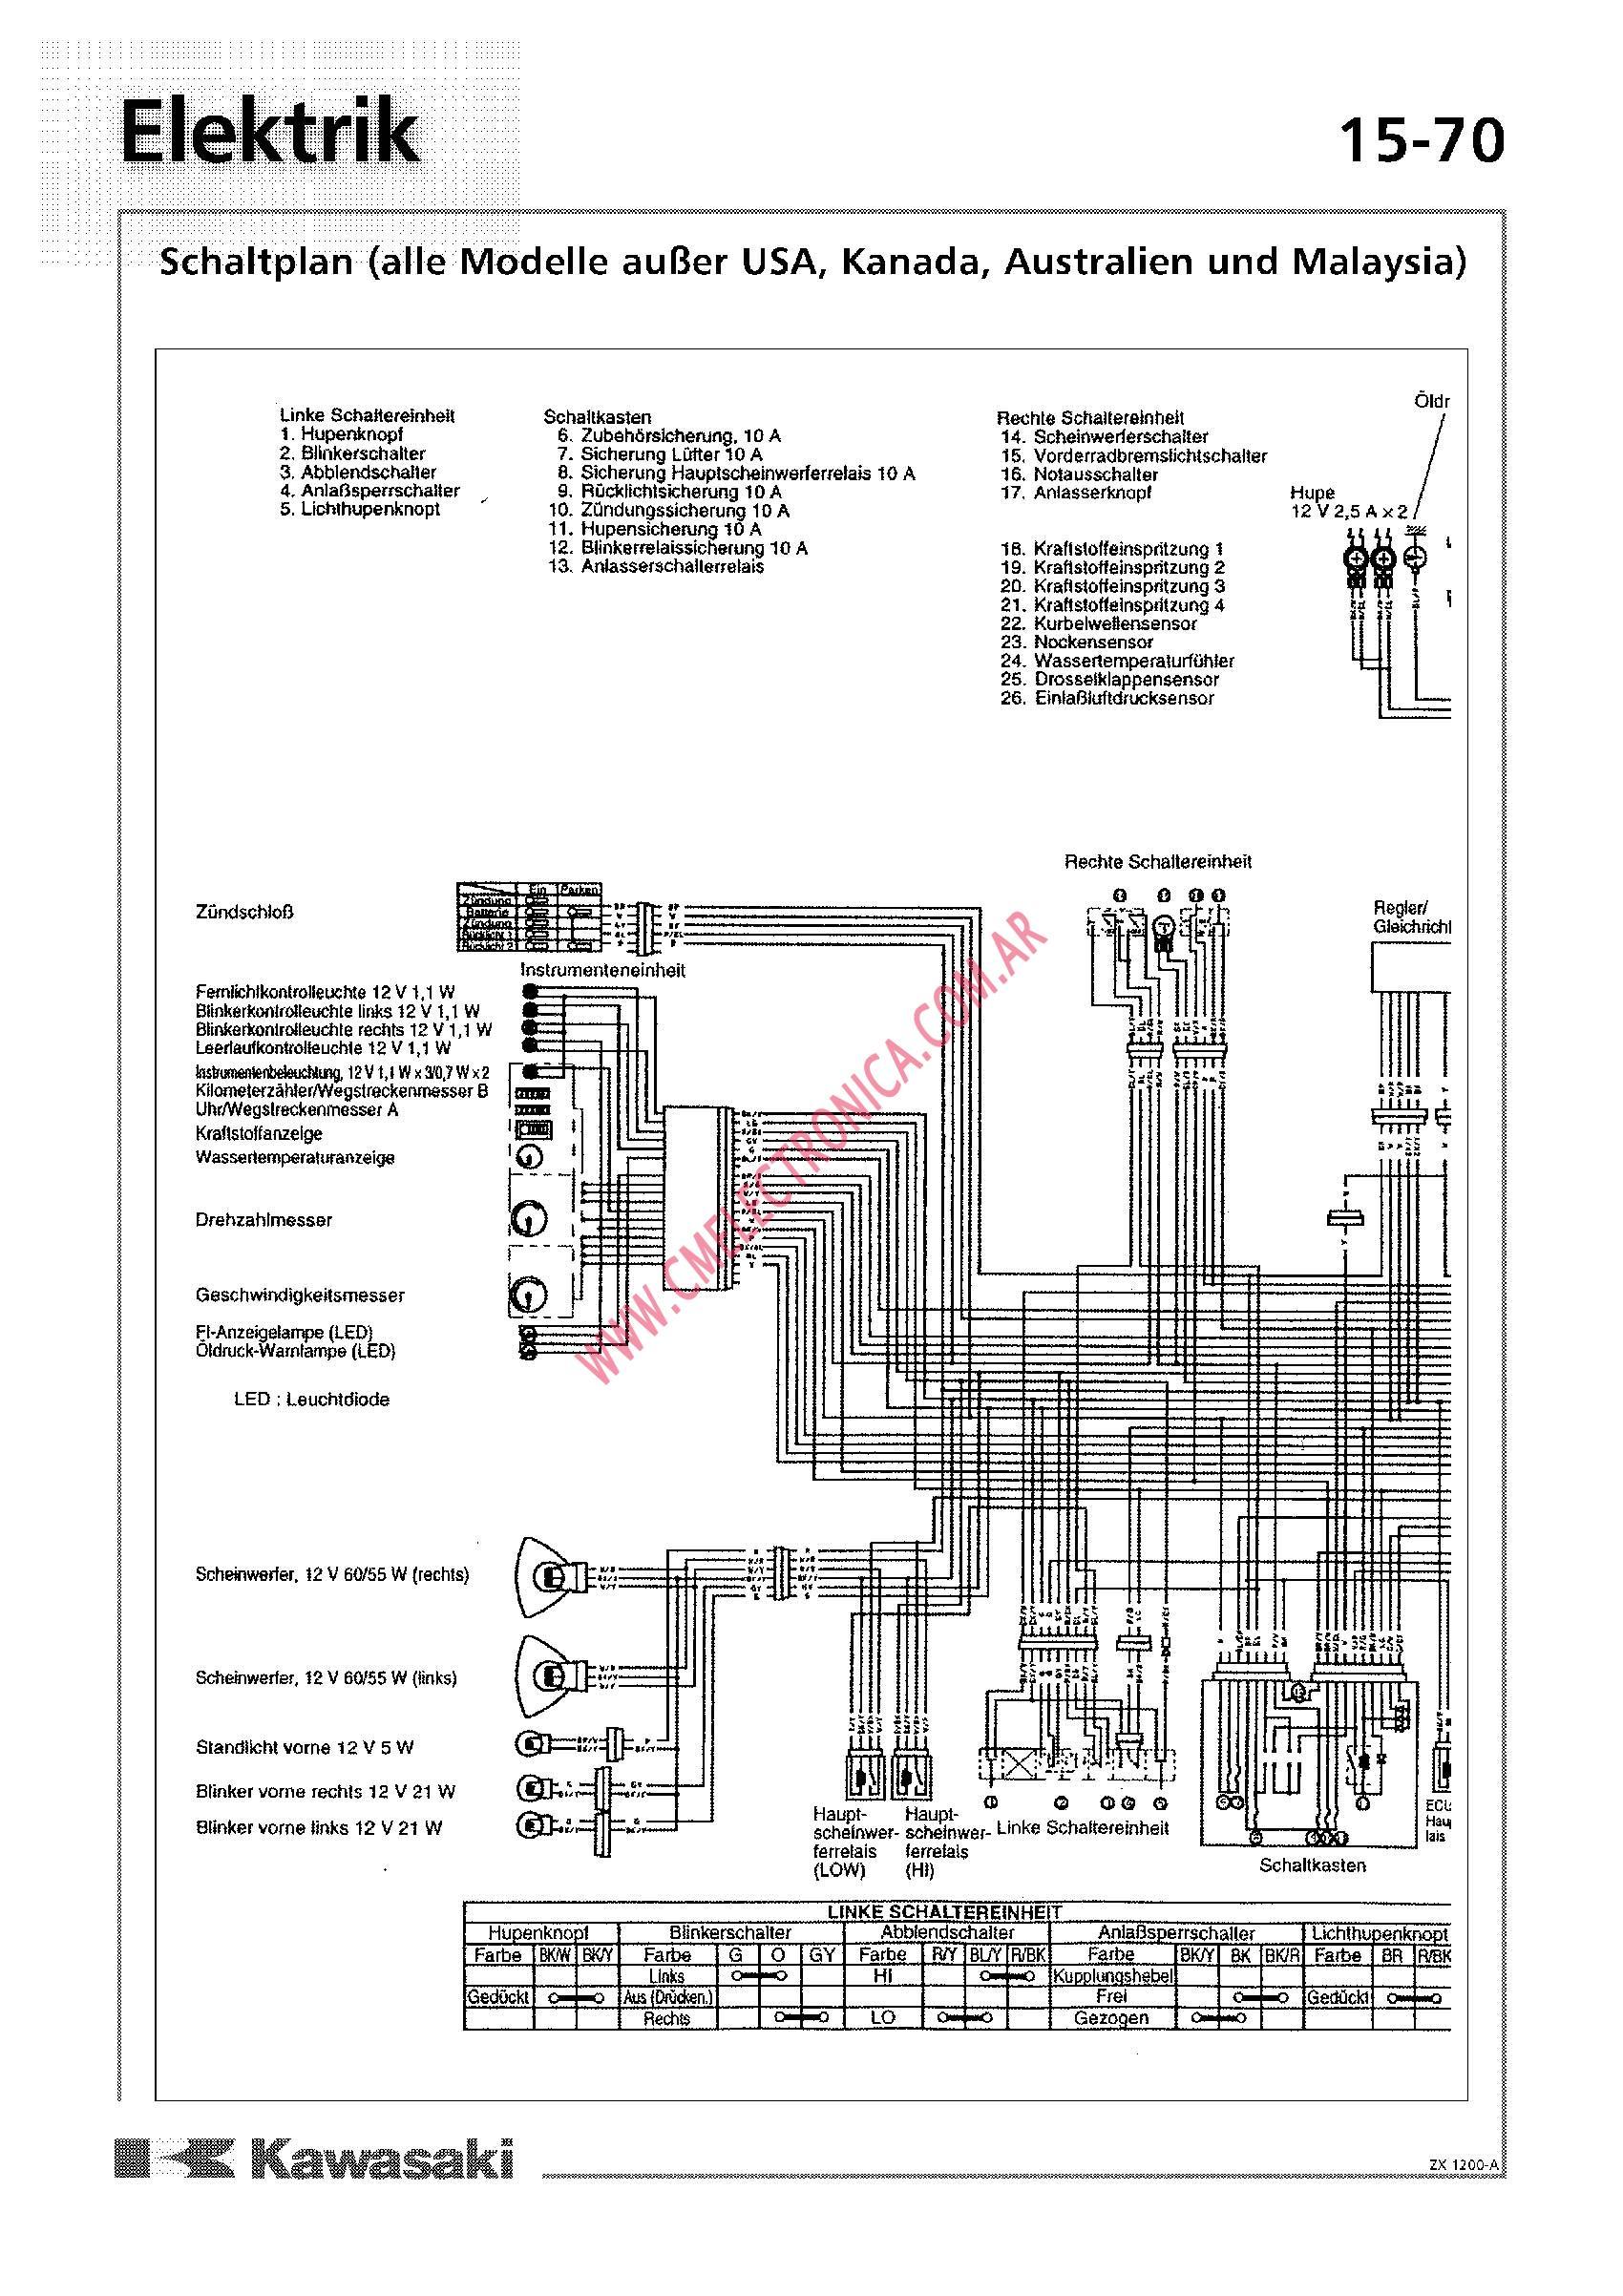 hight resolution of zx12 wiring diagram wiring diagram repair guideszx12 wiring diagram wiring diagram technicwiring diagram diagrama kawasaki zx12rkawasaki